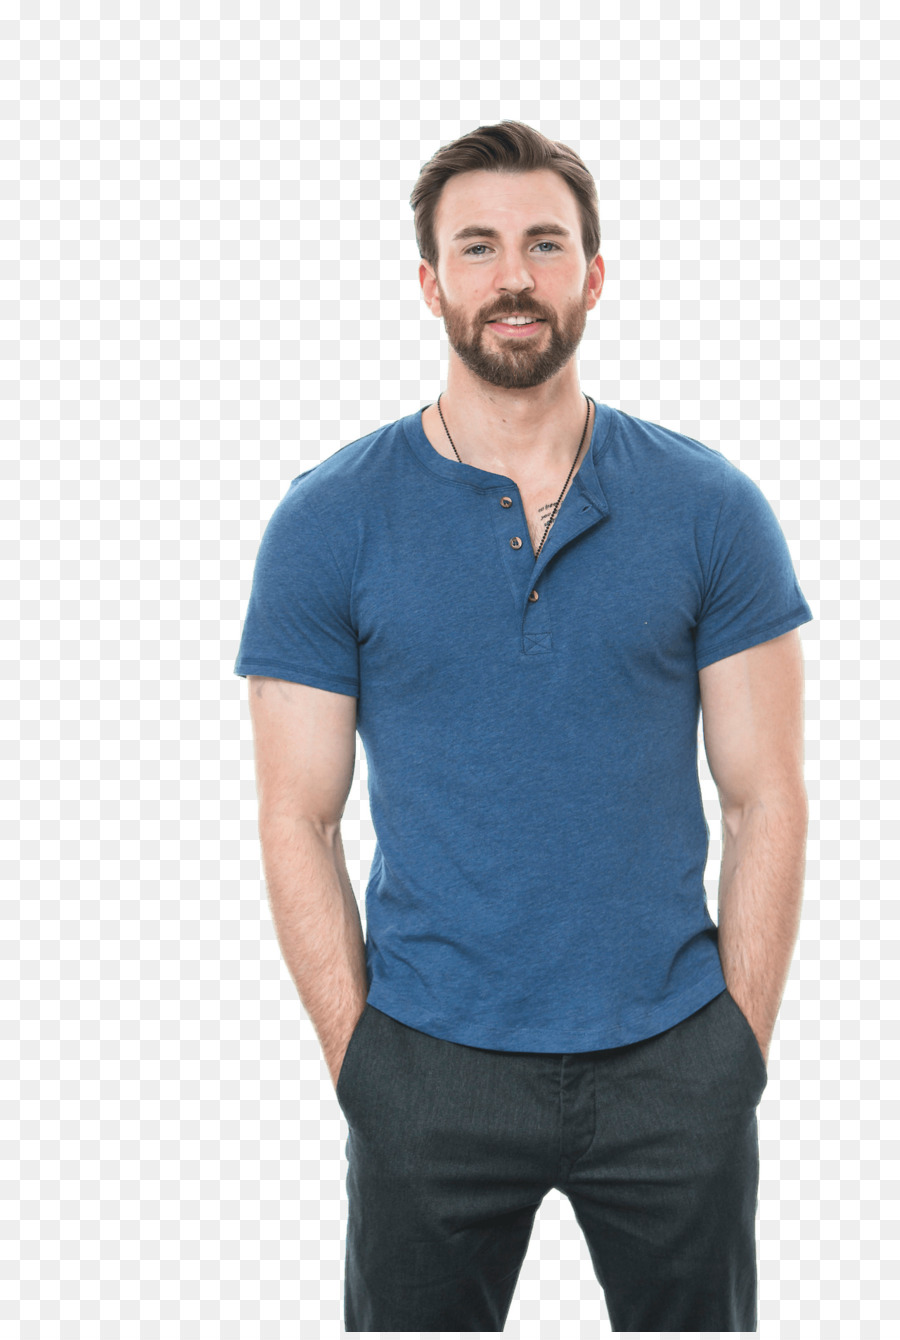 Chris Evans Captain America The First Avenger Chris Evans Png